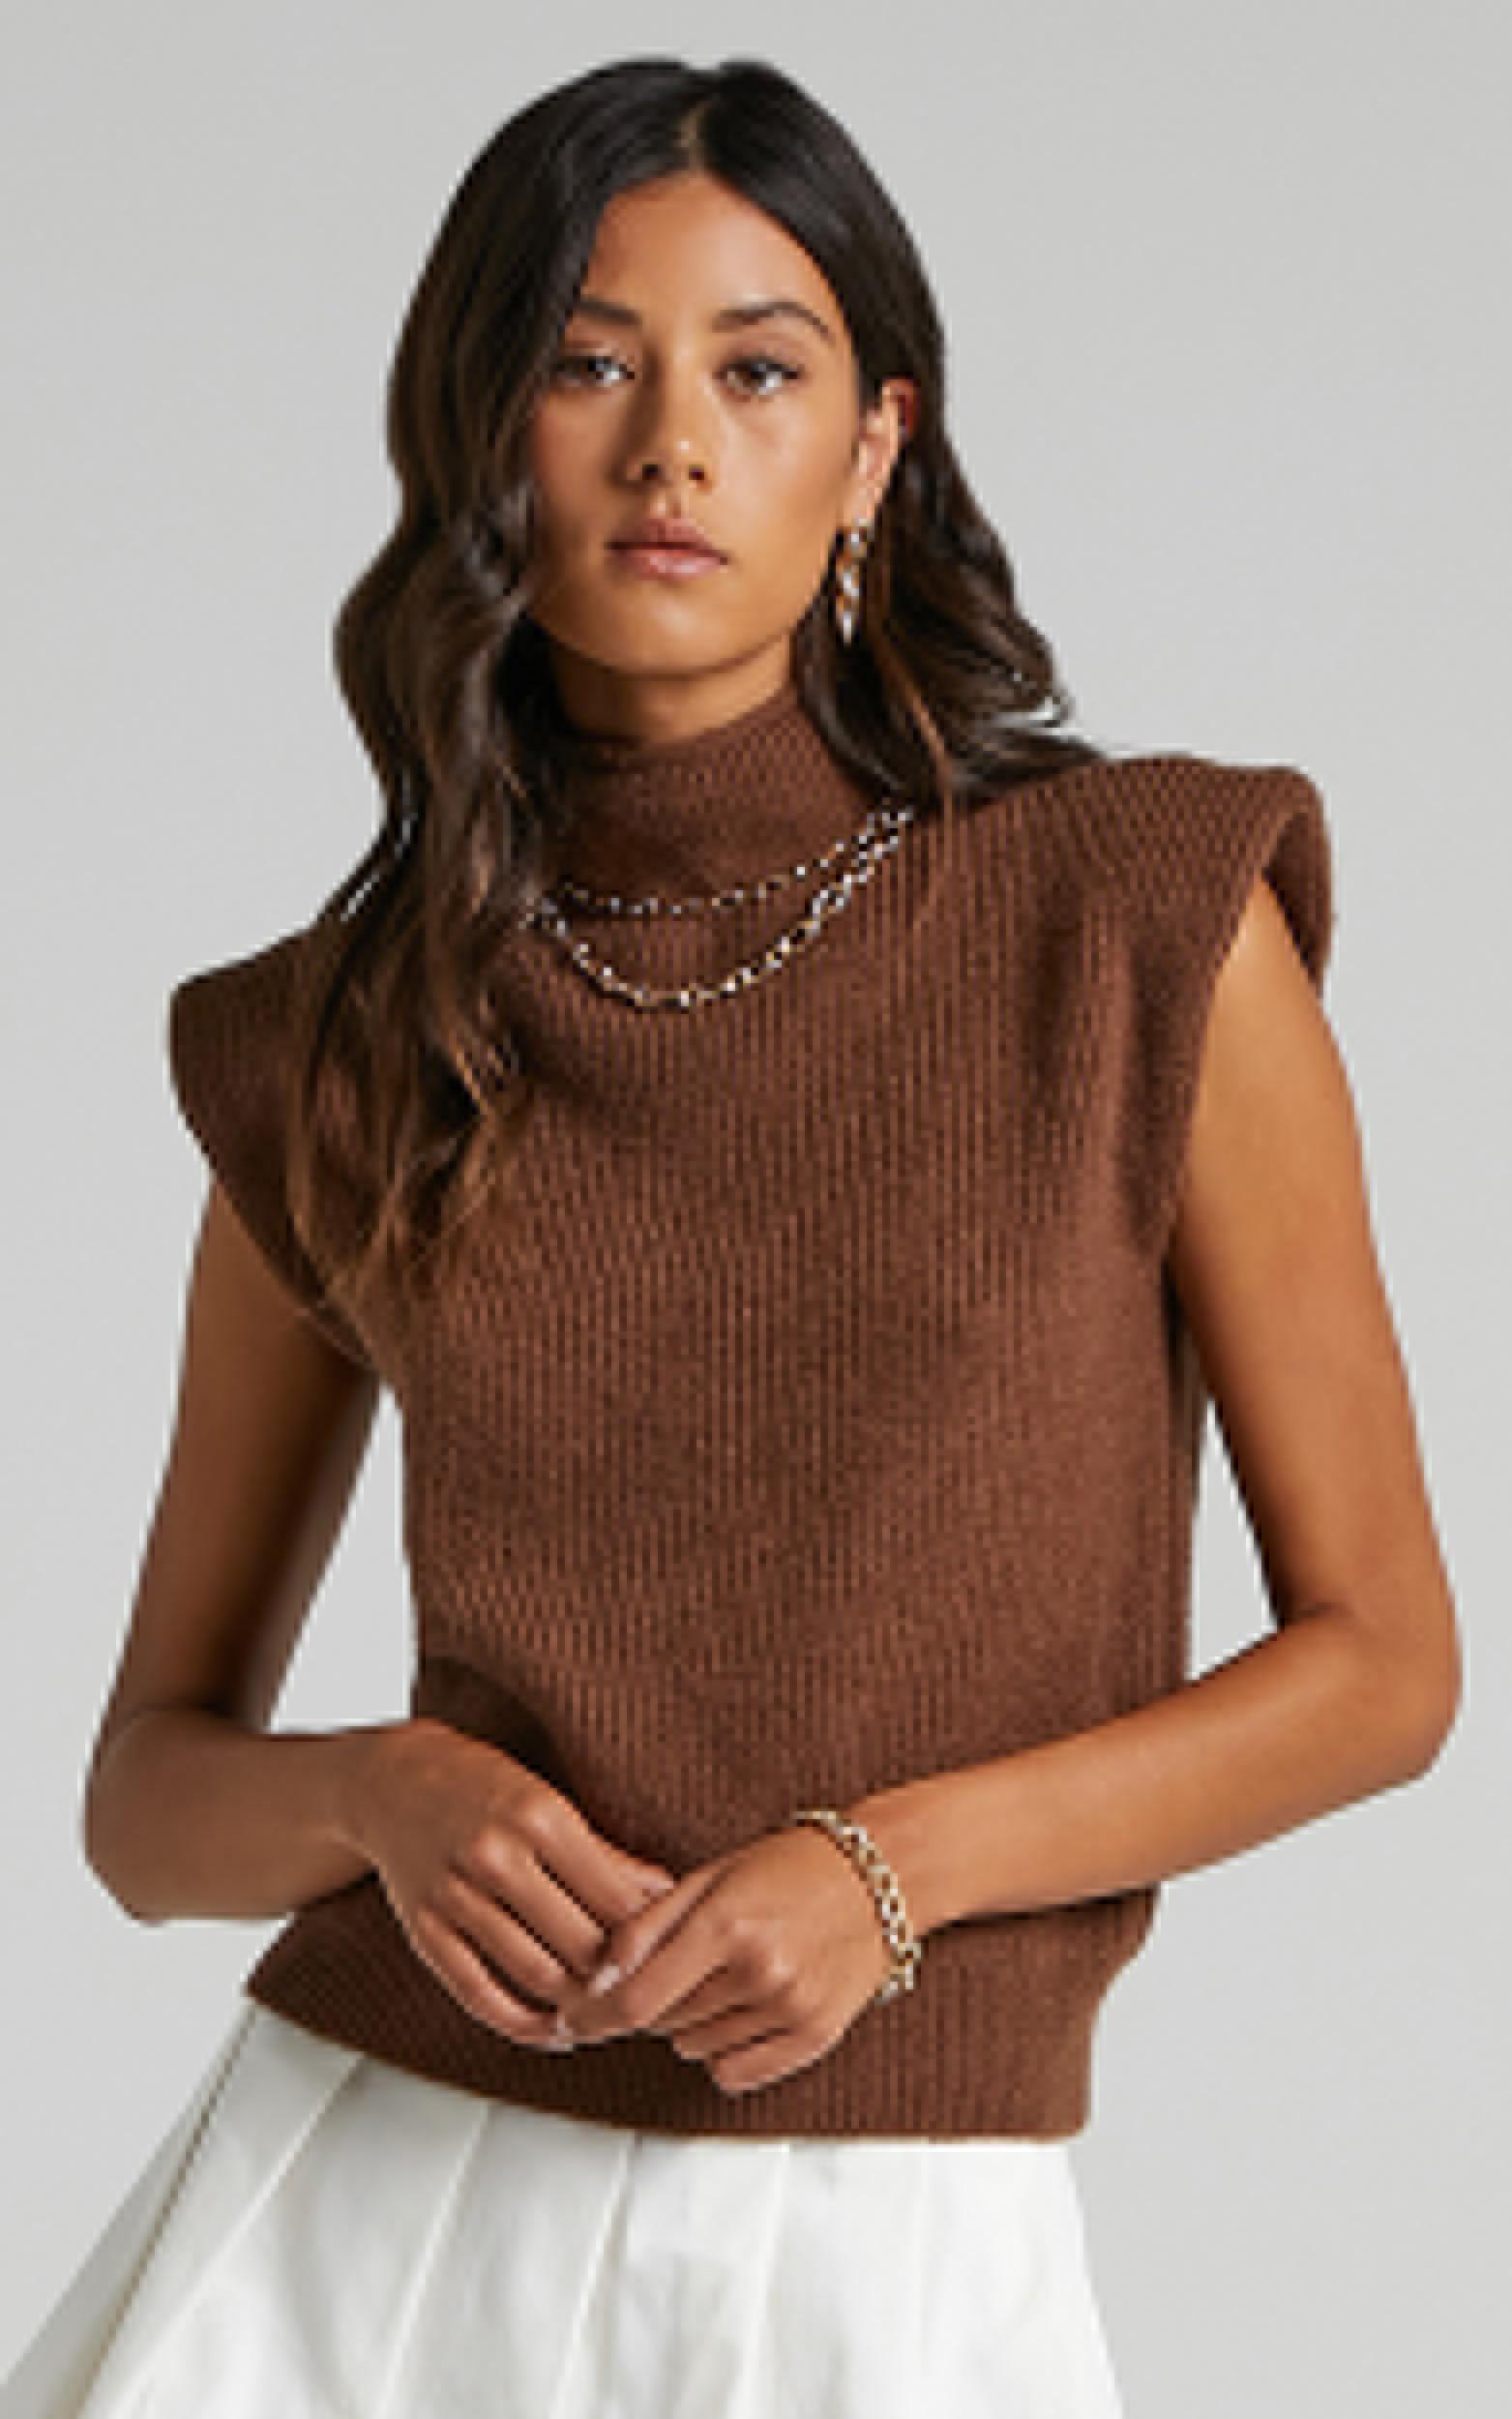 Crawford Knit Vest in Chocolate - 08, BRN2, hi-res image number null